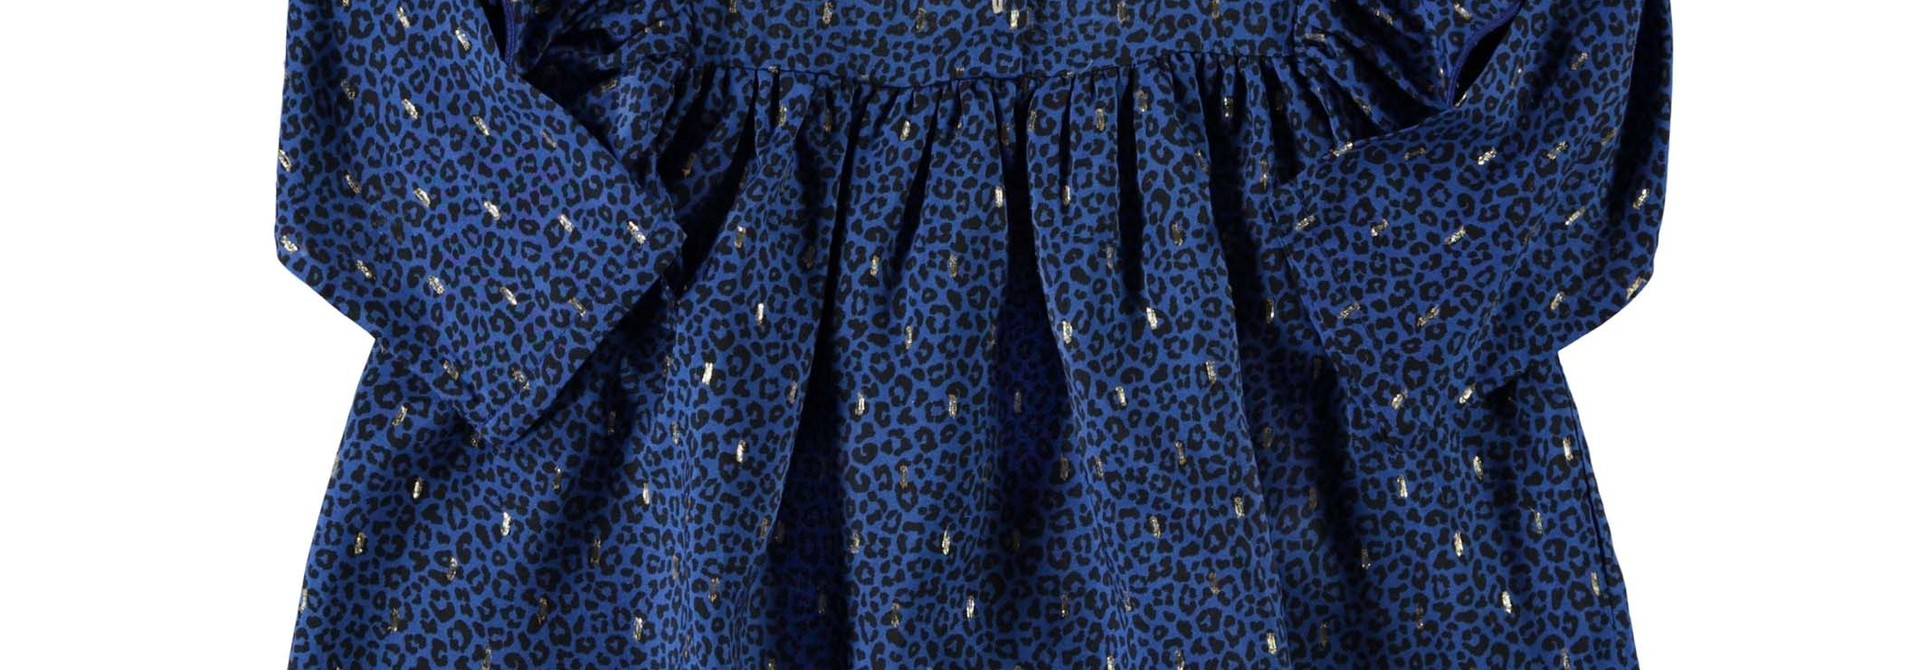 short dress w/ frills on shoulders | indigo animal print w/ golden lurex